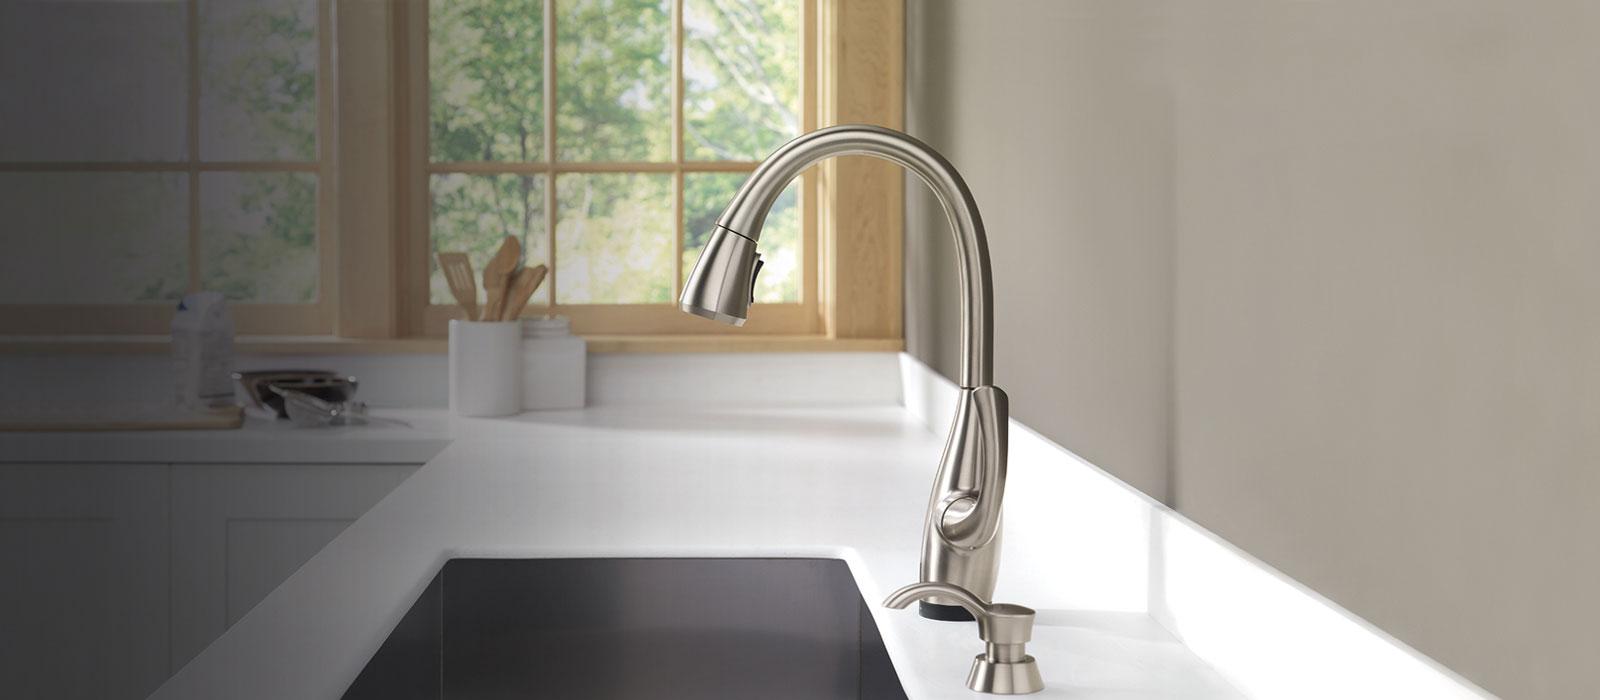 dominic kitchen collection delta faucet